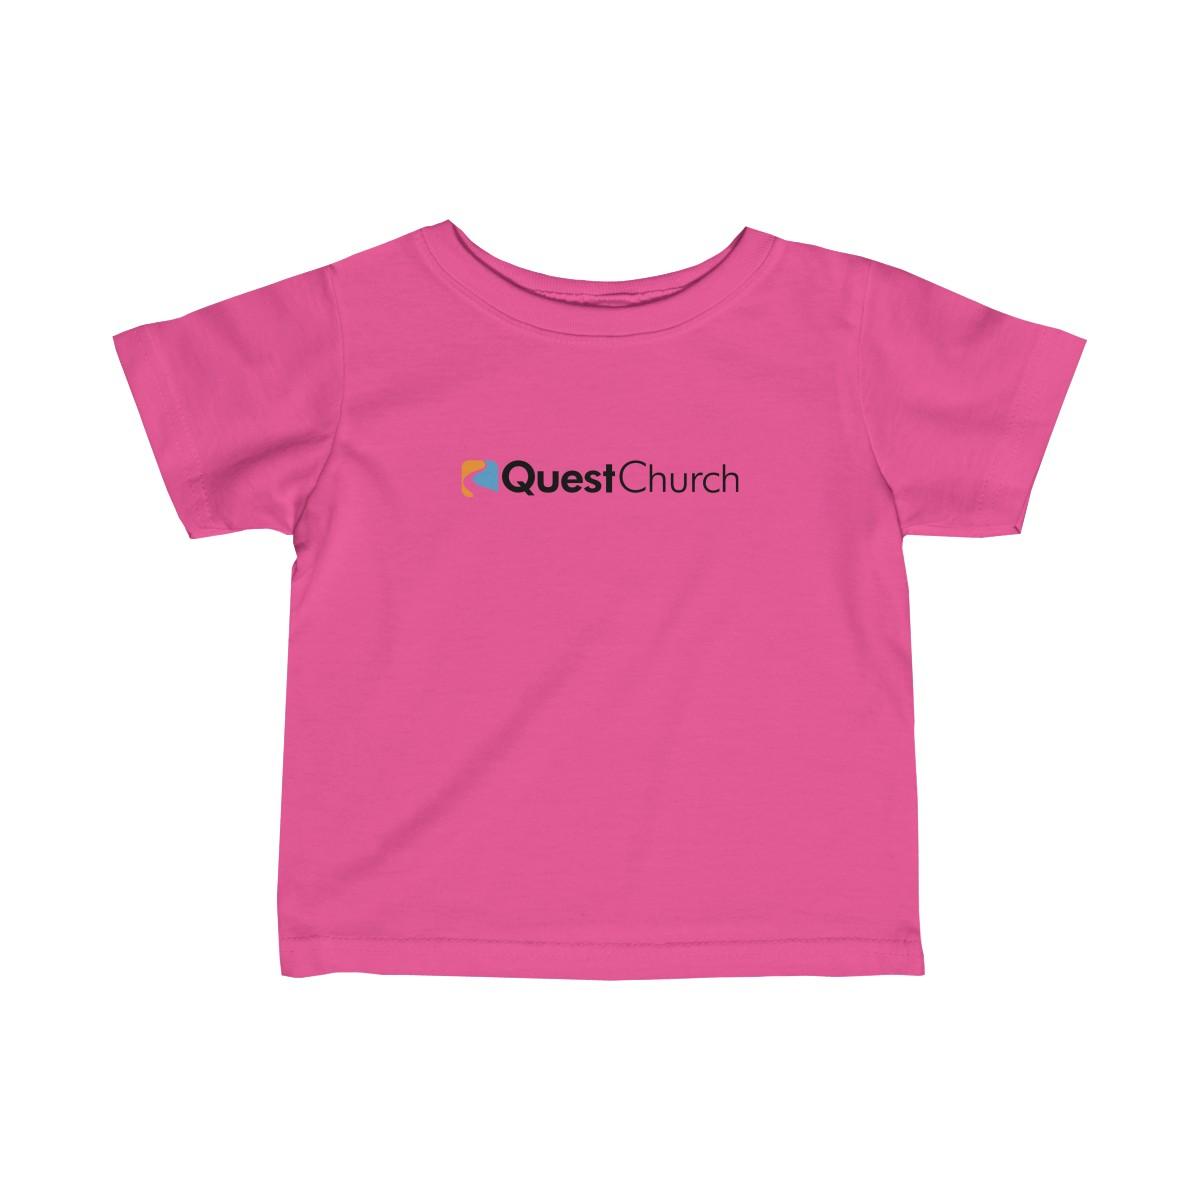 b7c175fa Infant Quest Tee - The Quest Church